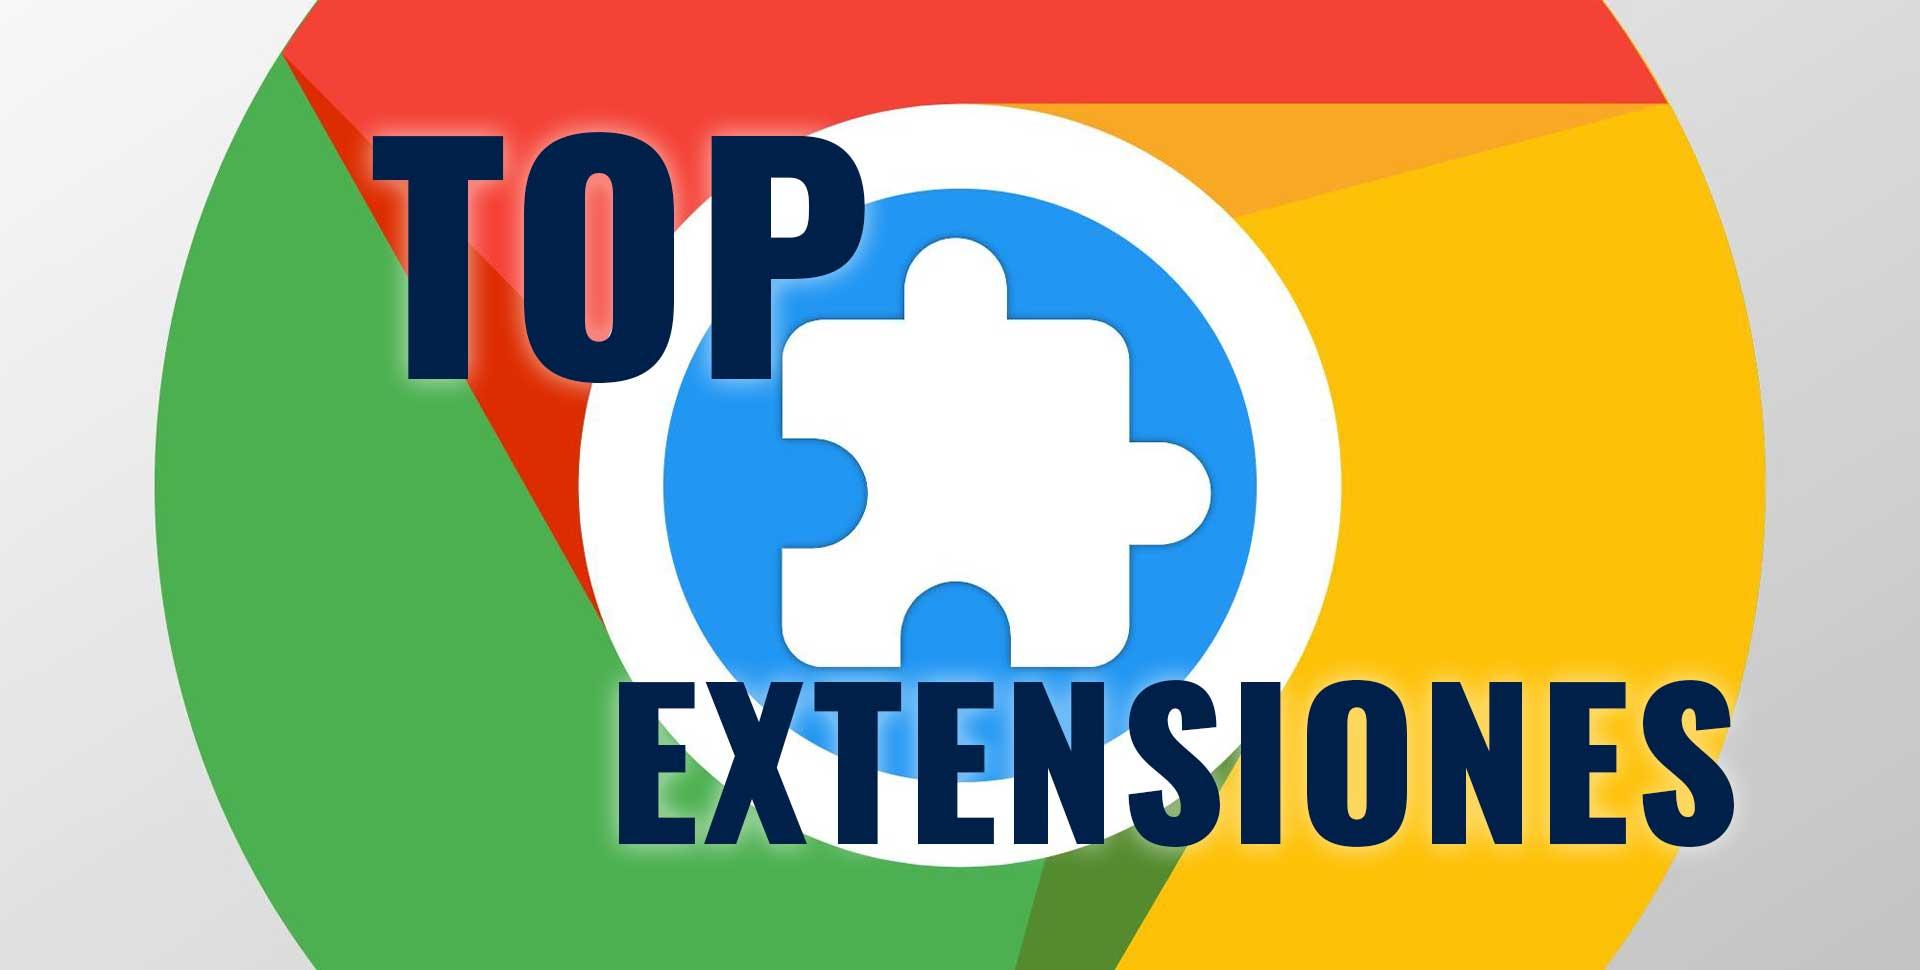 Top Extensiones google